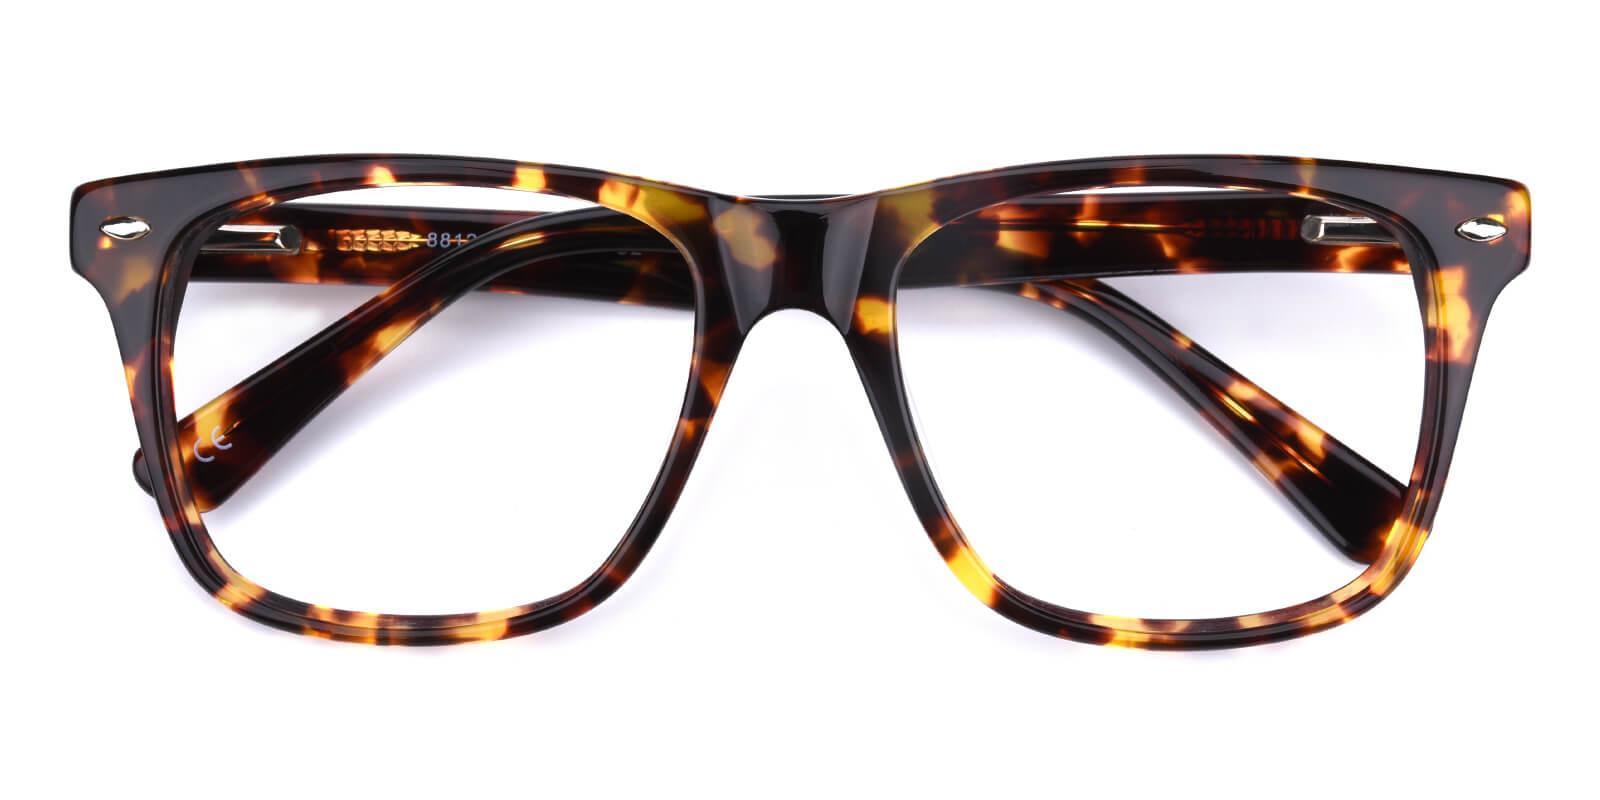 Bridinry-Tortoise-Square-Acetate-Eyeglasses-detail